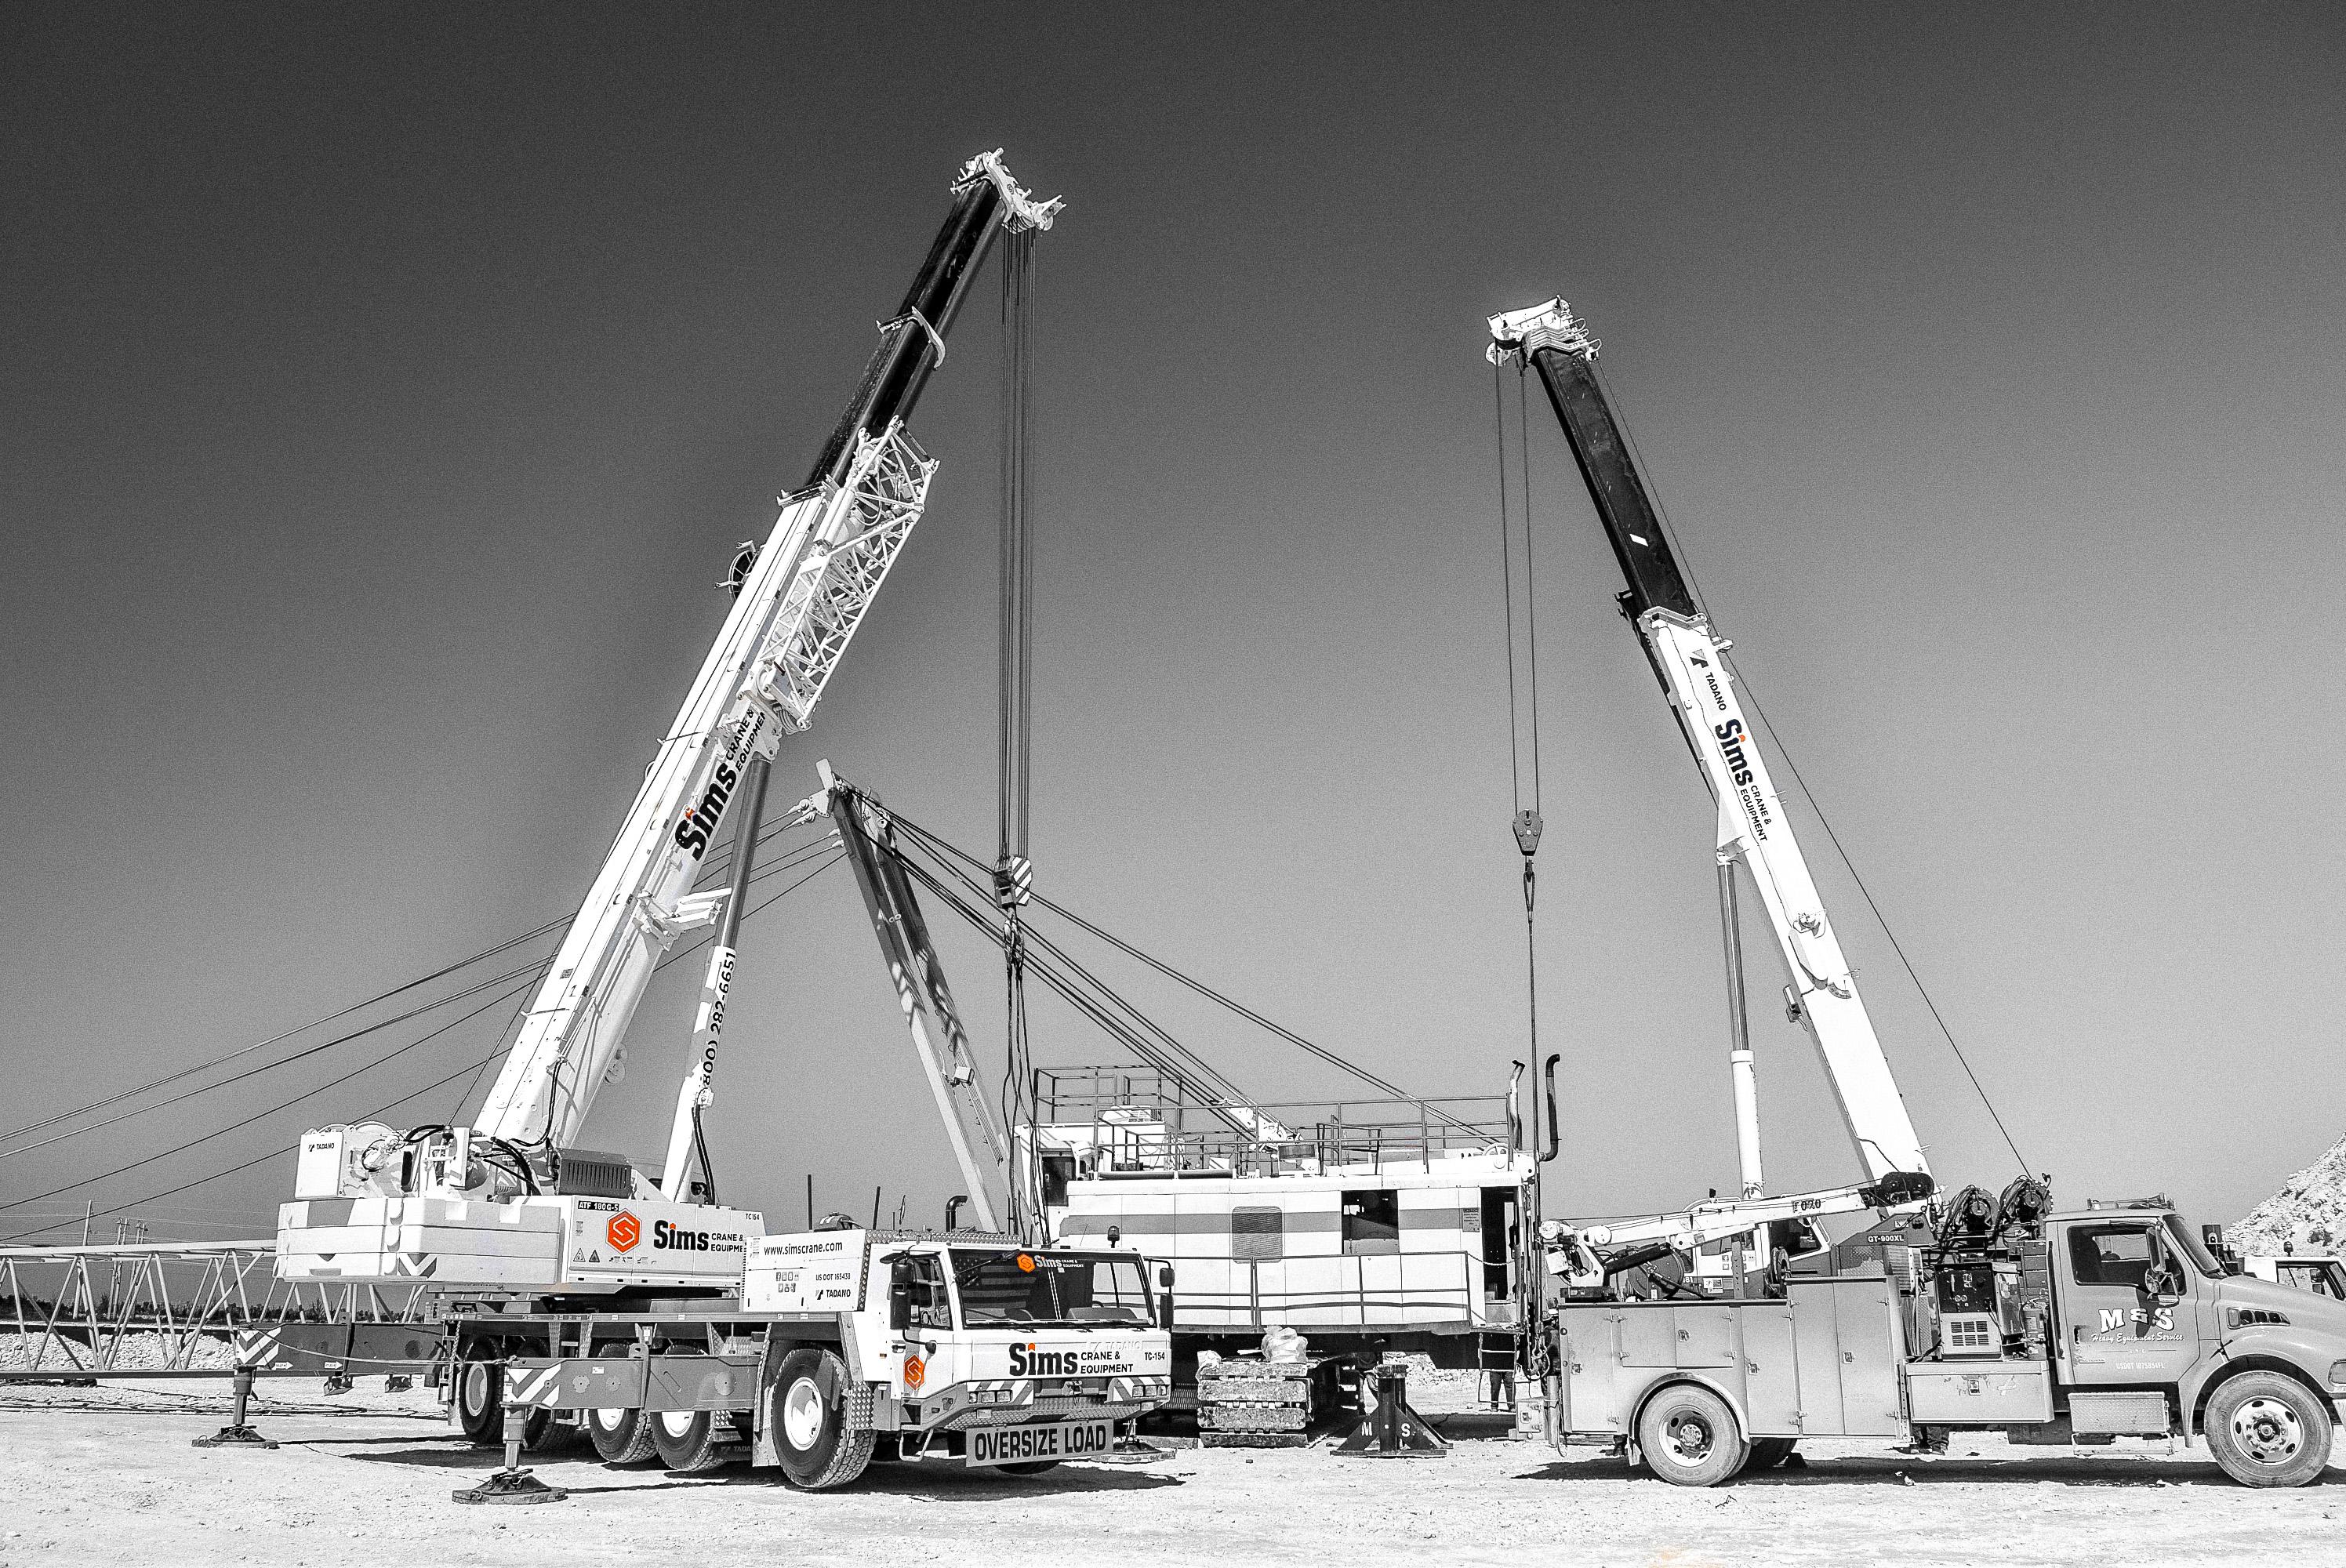 Sims Crane & Equipment Co. image 1